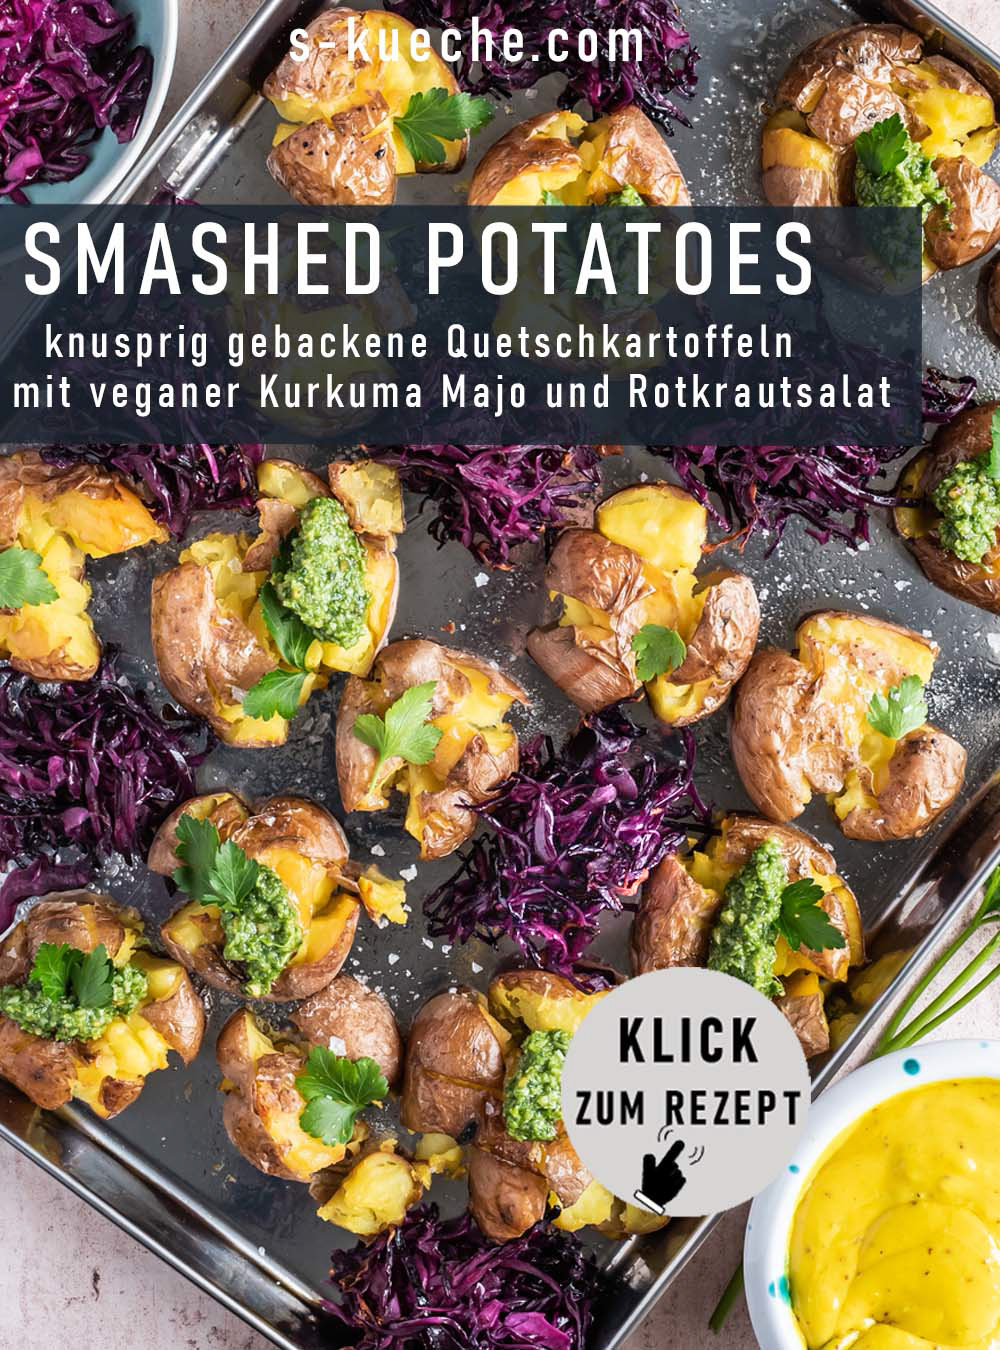 Smashed Potatoes - knusprig gebackene Quetschkartoffeln